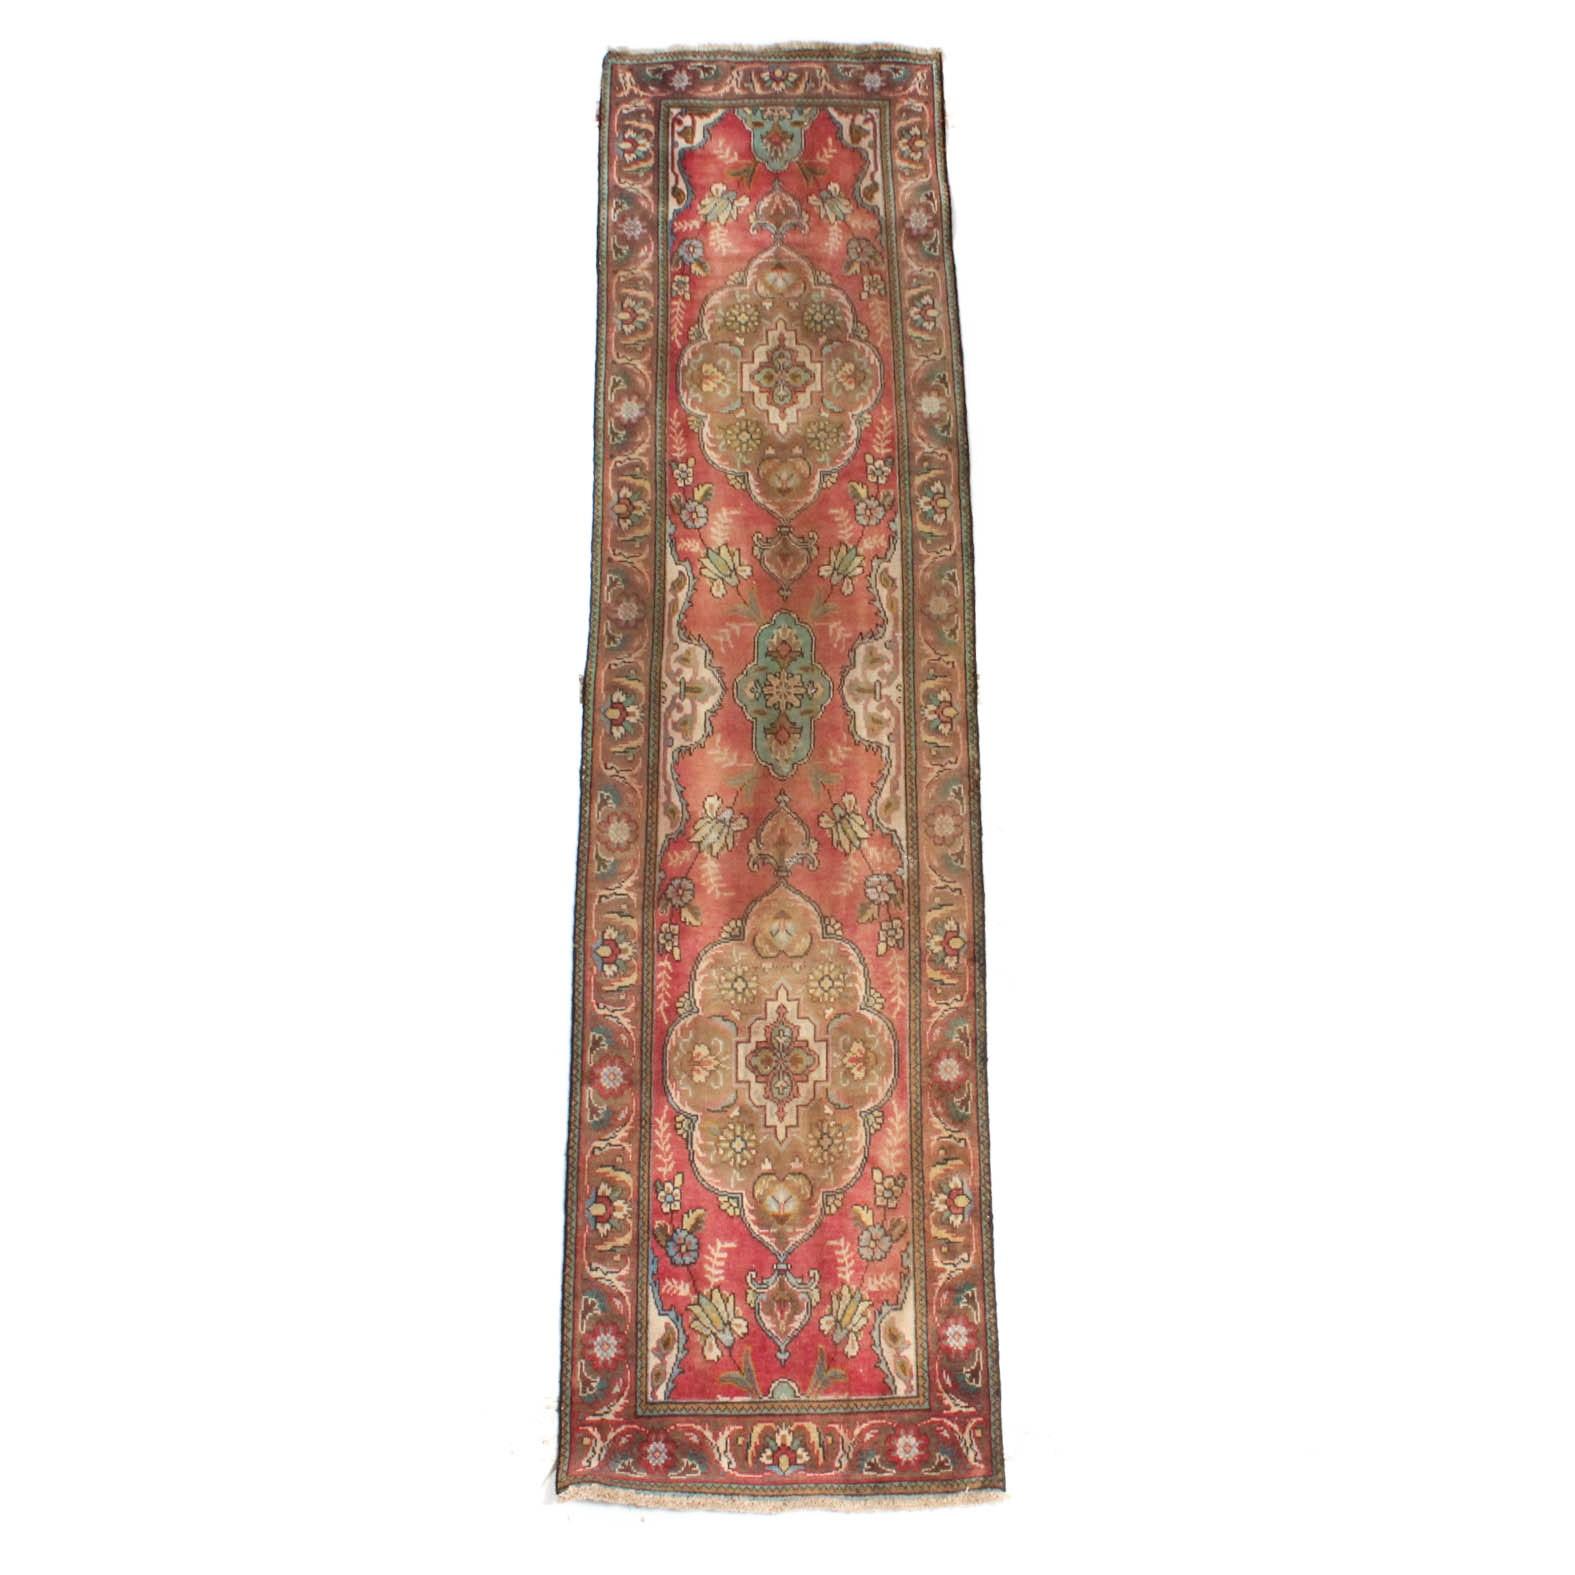 Vintage Hand-Knotted Persian Tabriz Carpet Runner